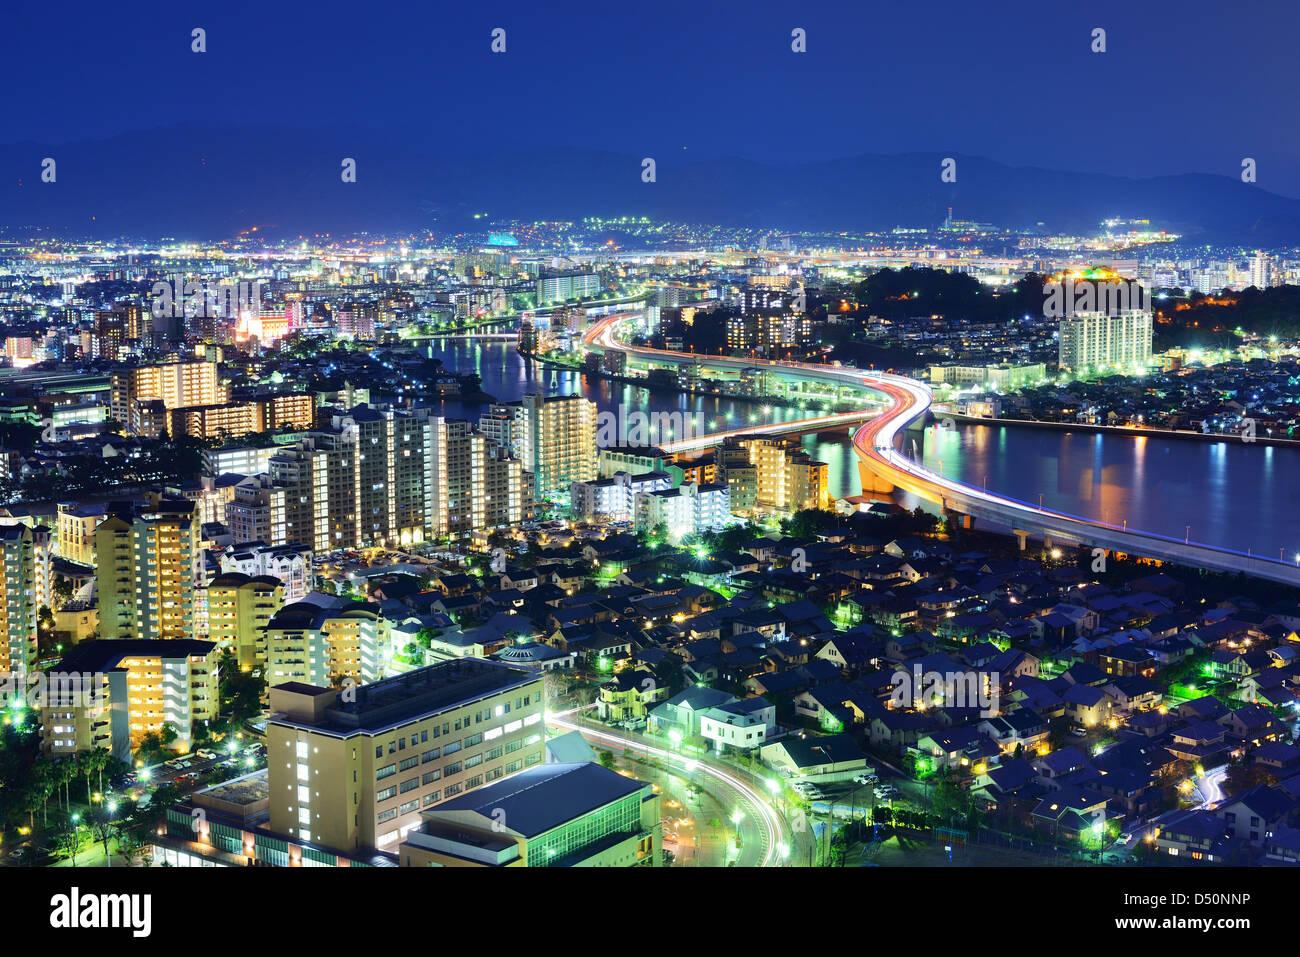 Skyline of Fukuoka, Japan at night. - Stock Image